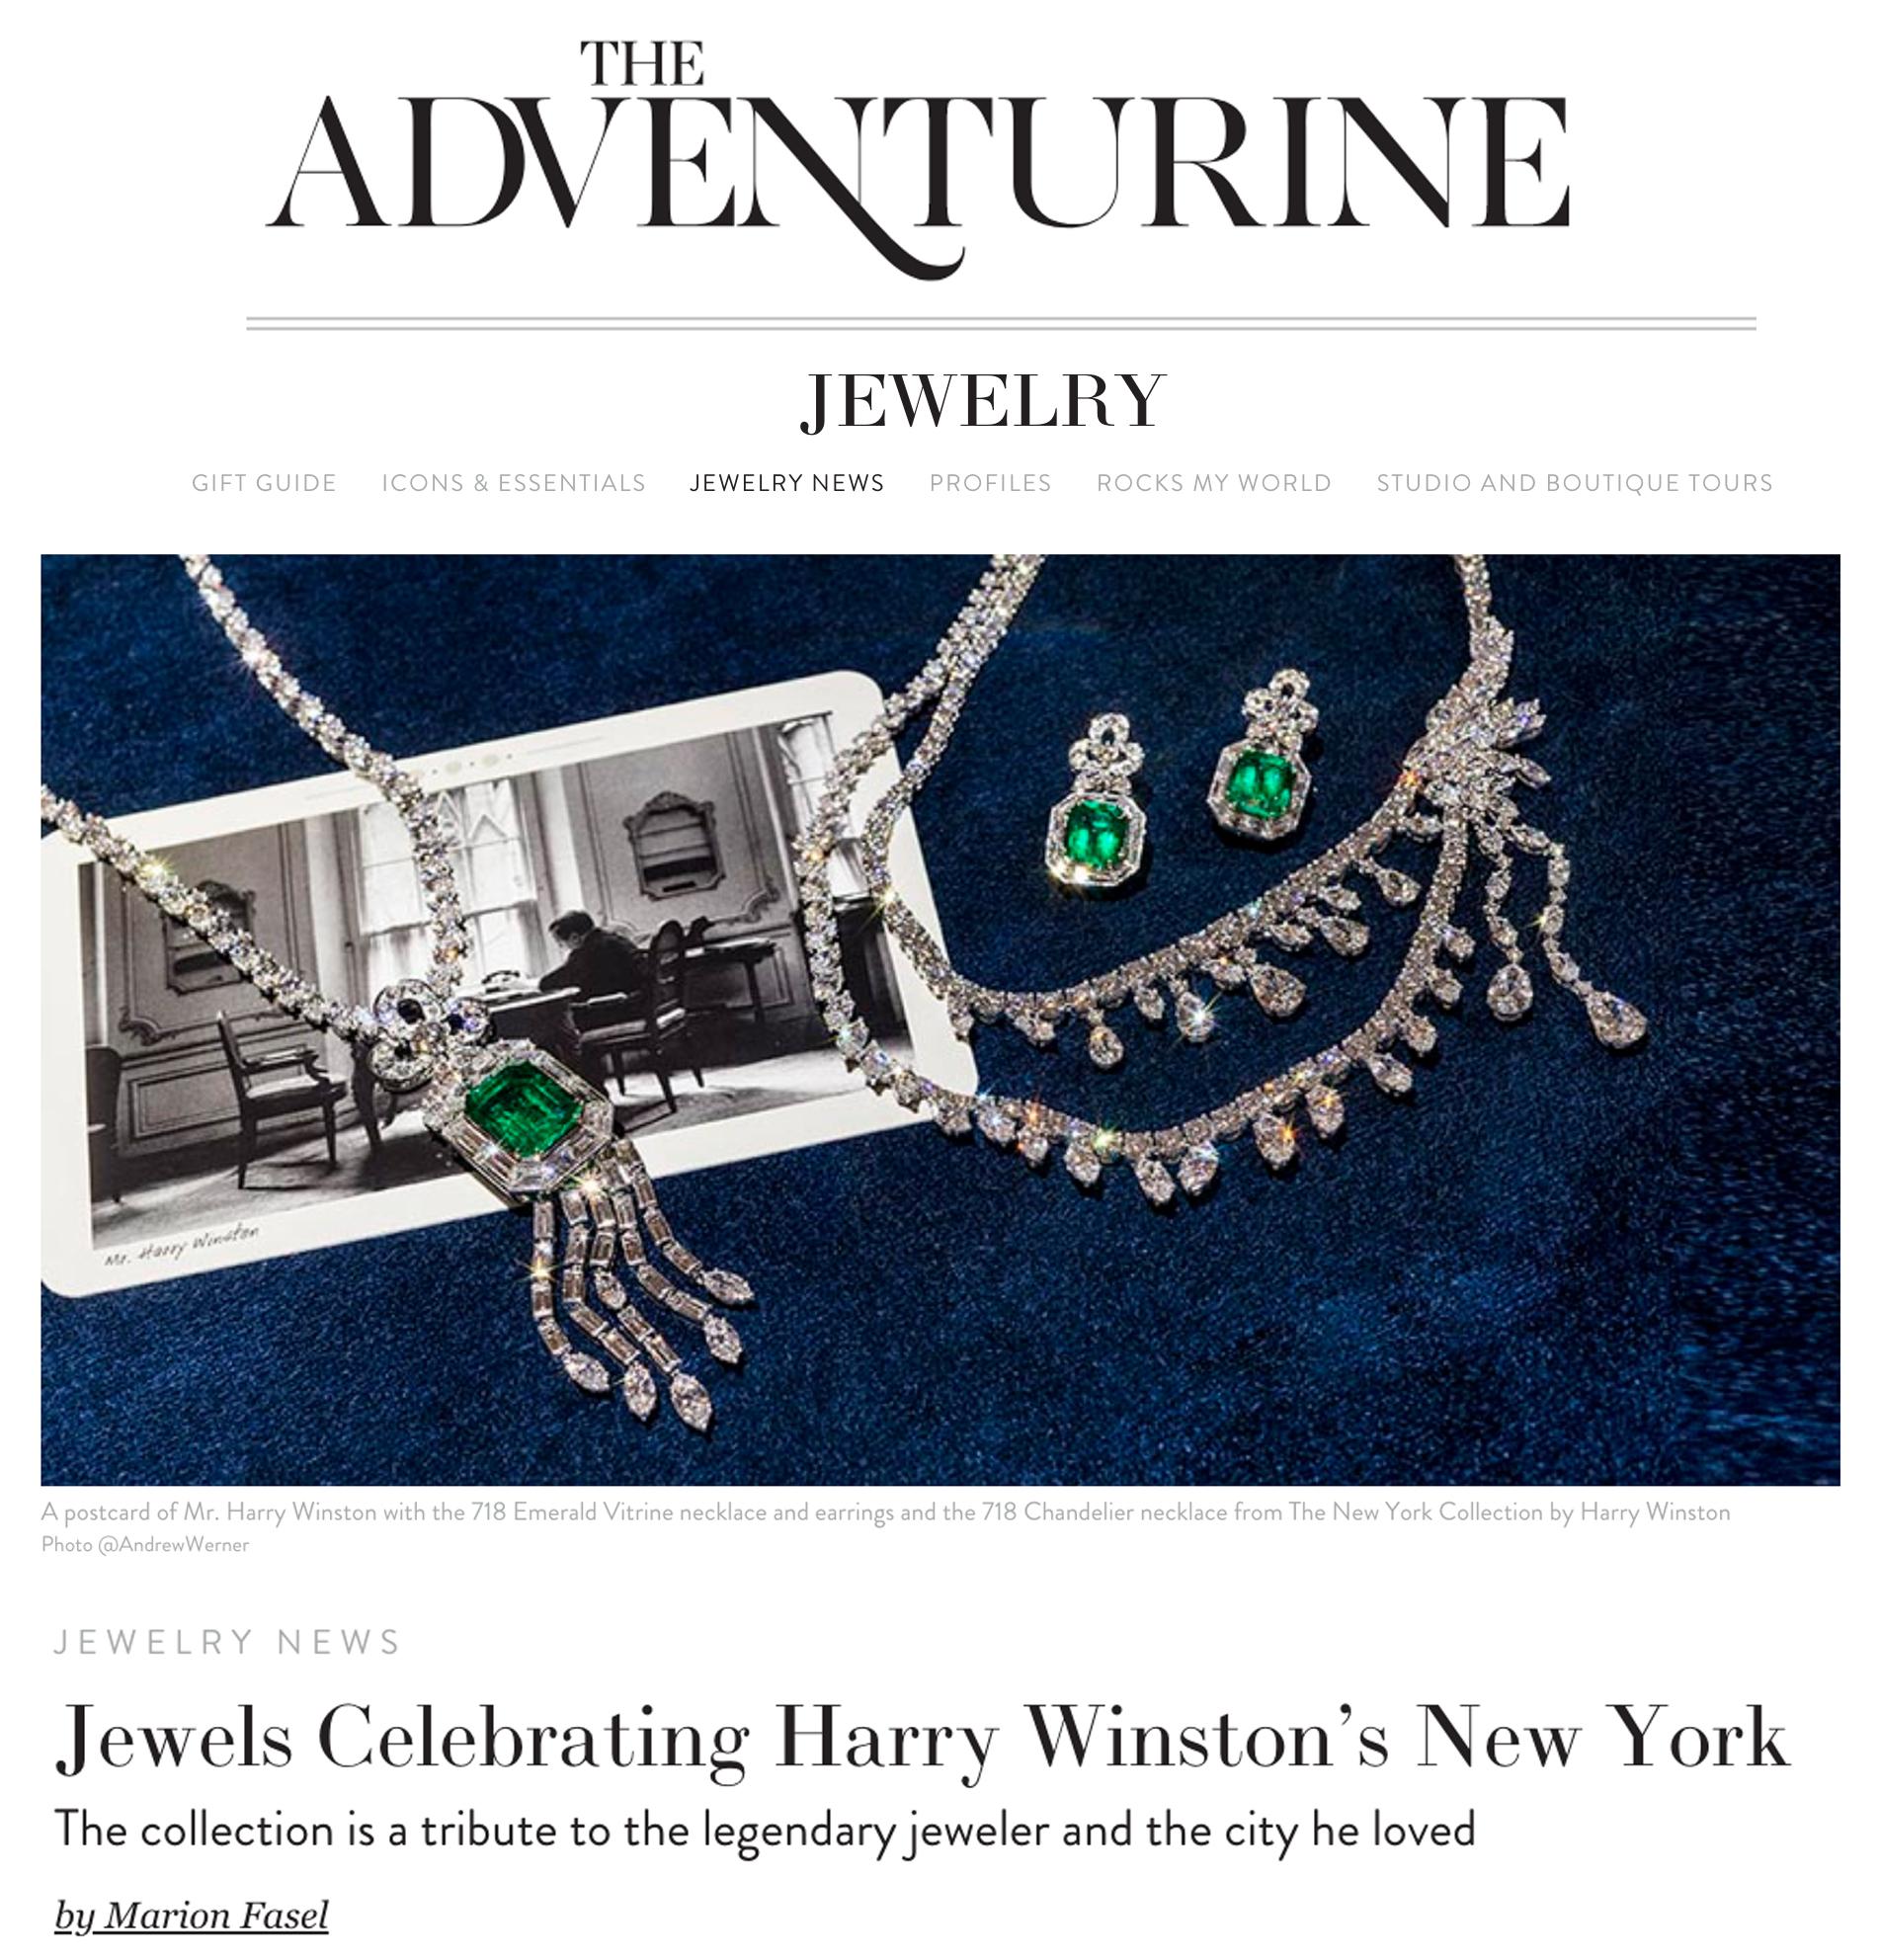 THE ADVENTURINE - JEWELS CELEBRATING HARRY WINSTON'S NEW YORK